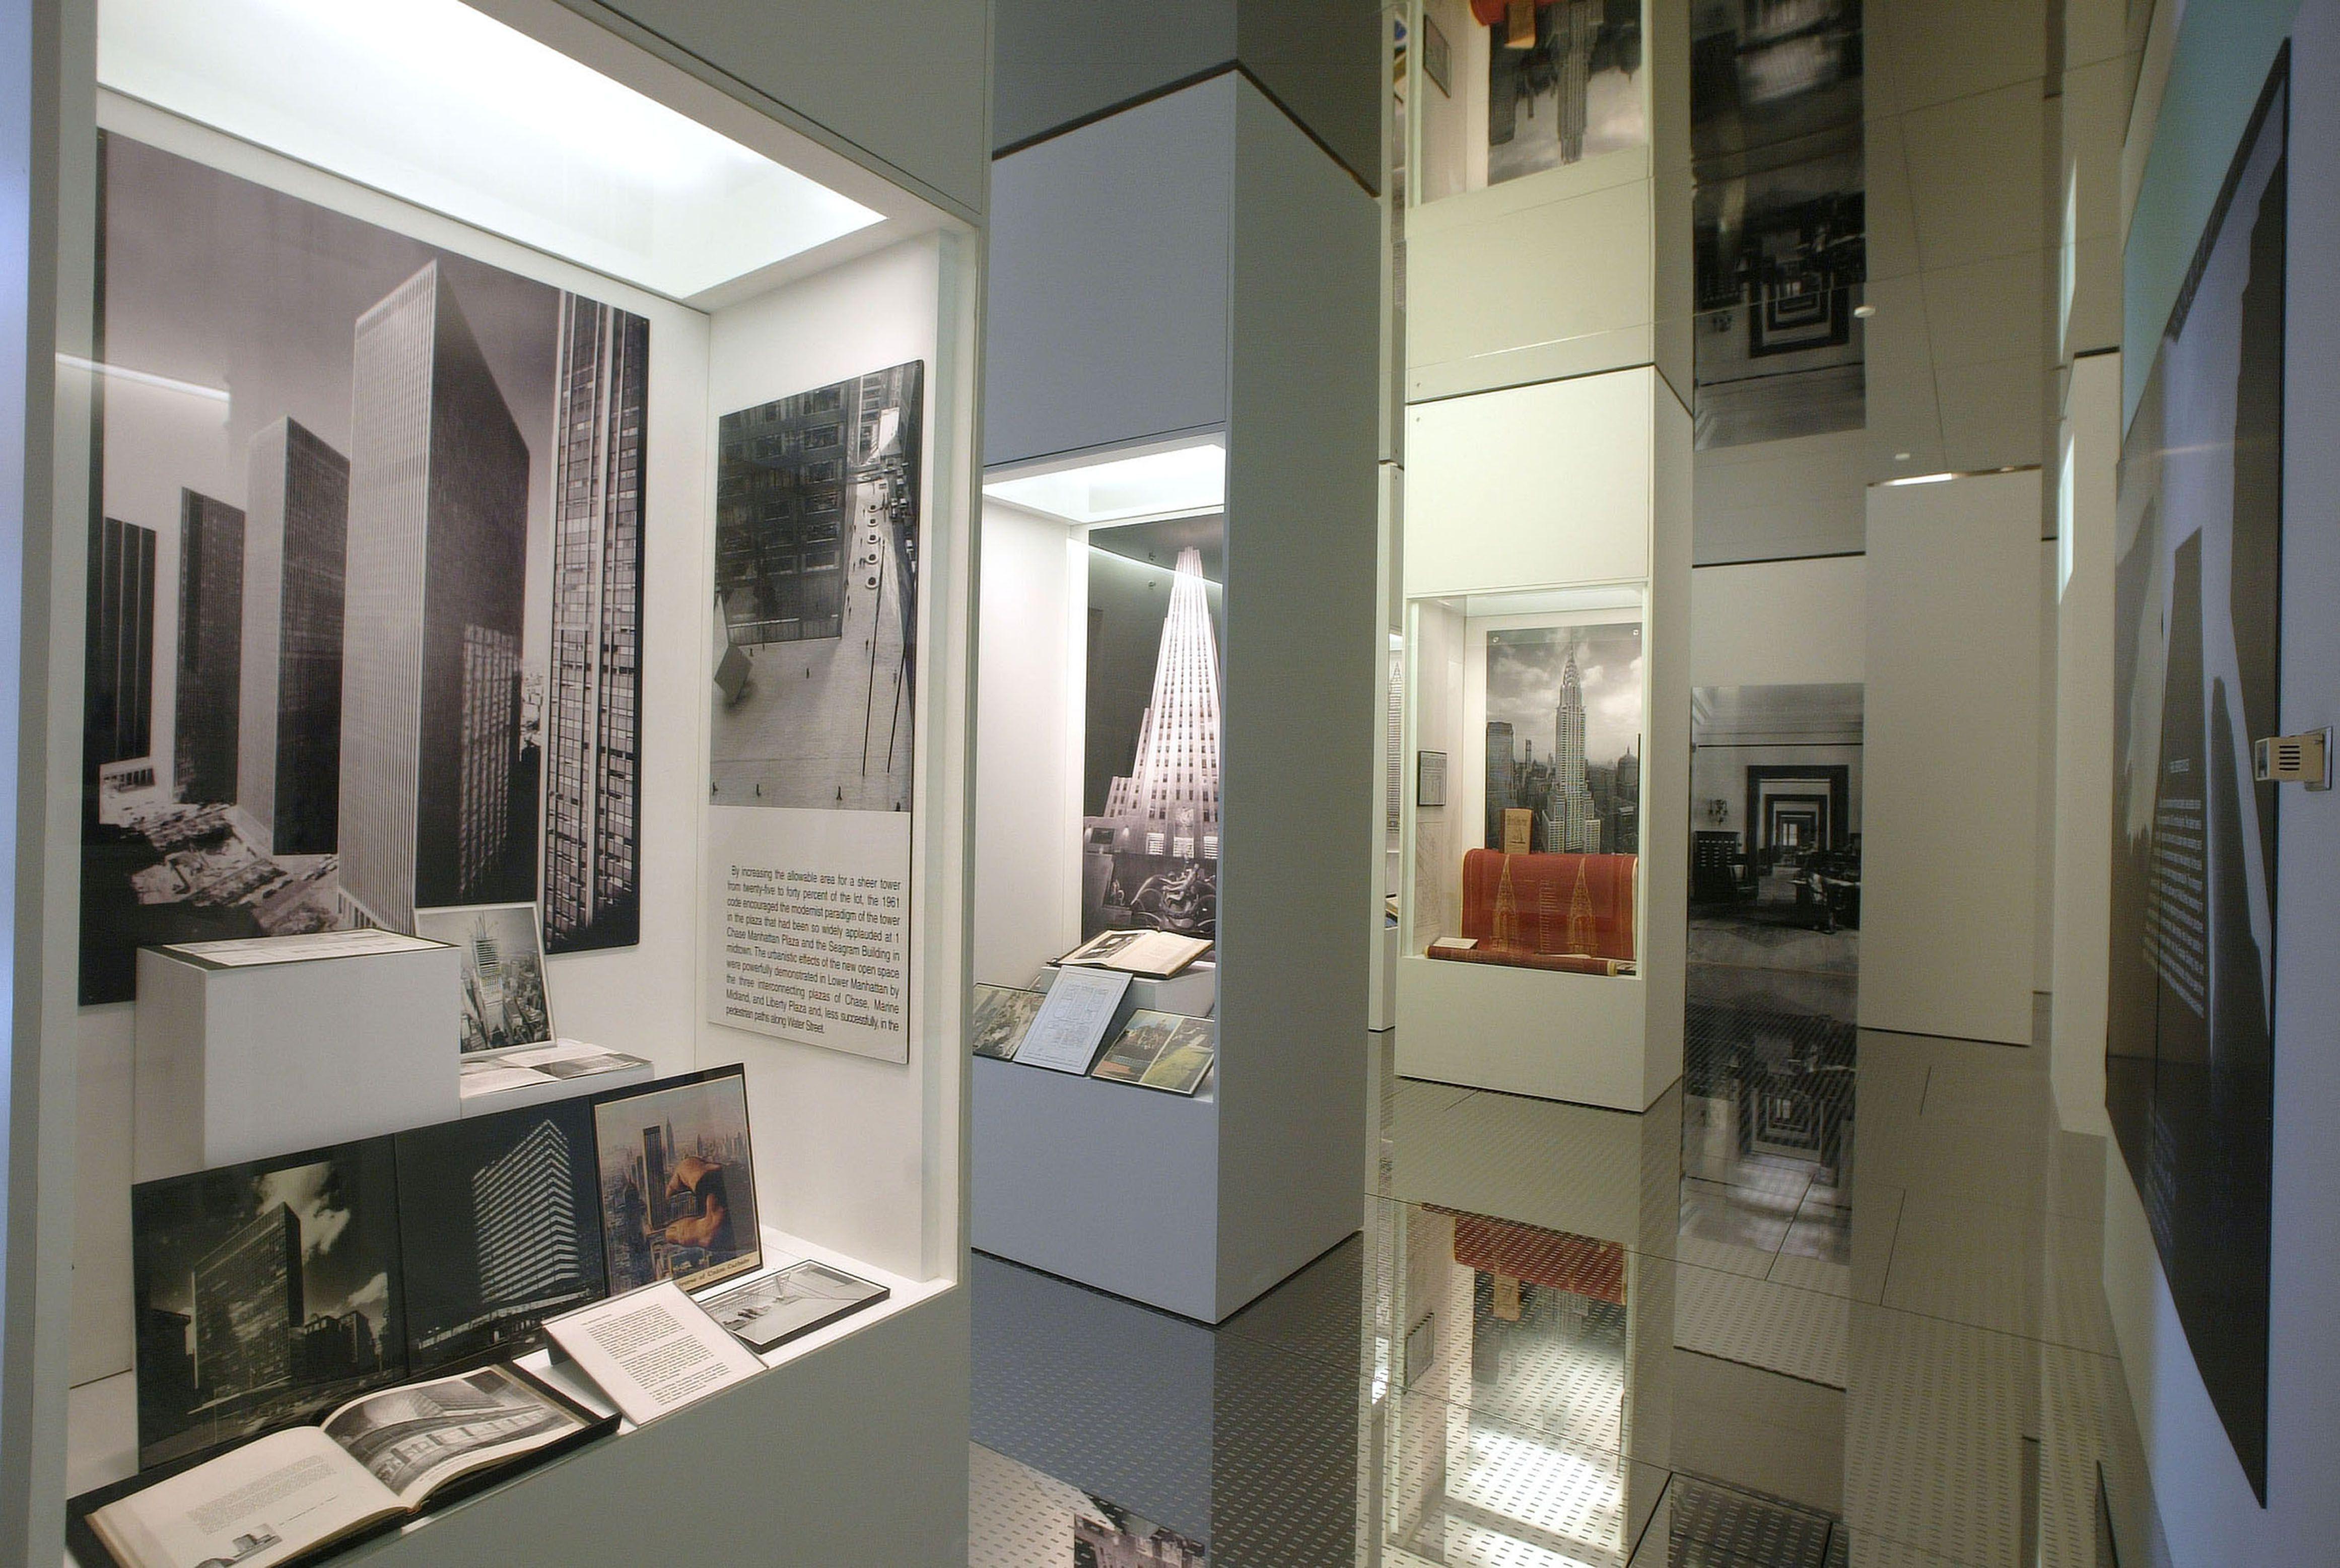 The Skyscraper Museum opens in New York City